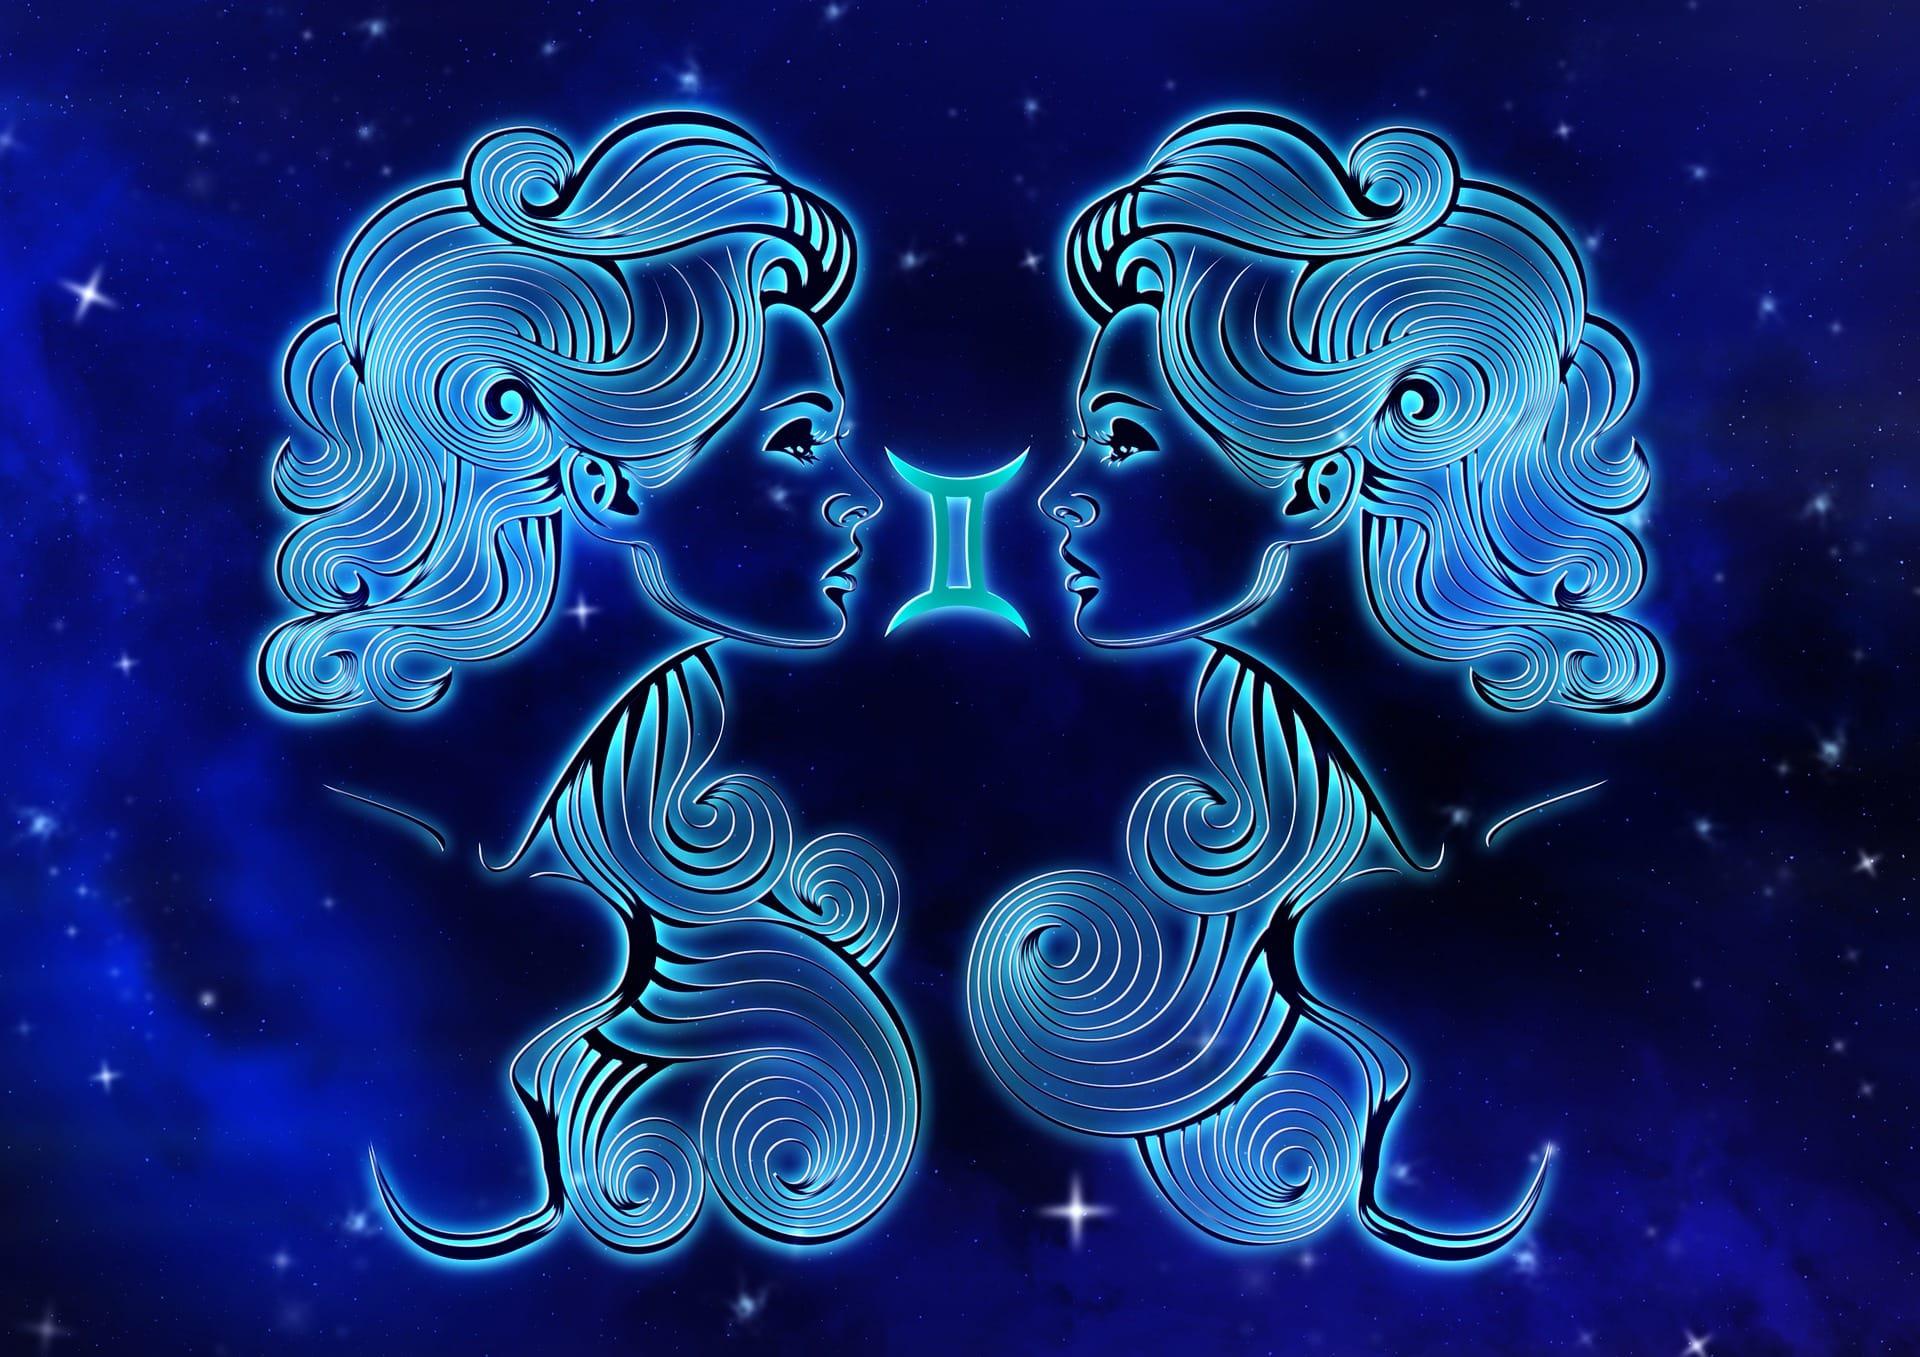 Zwilling Frau erobern - Anfang